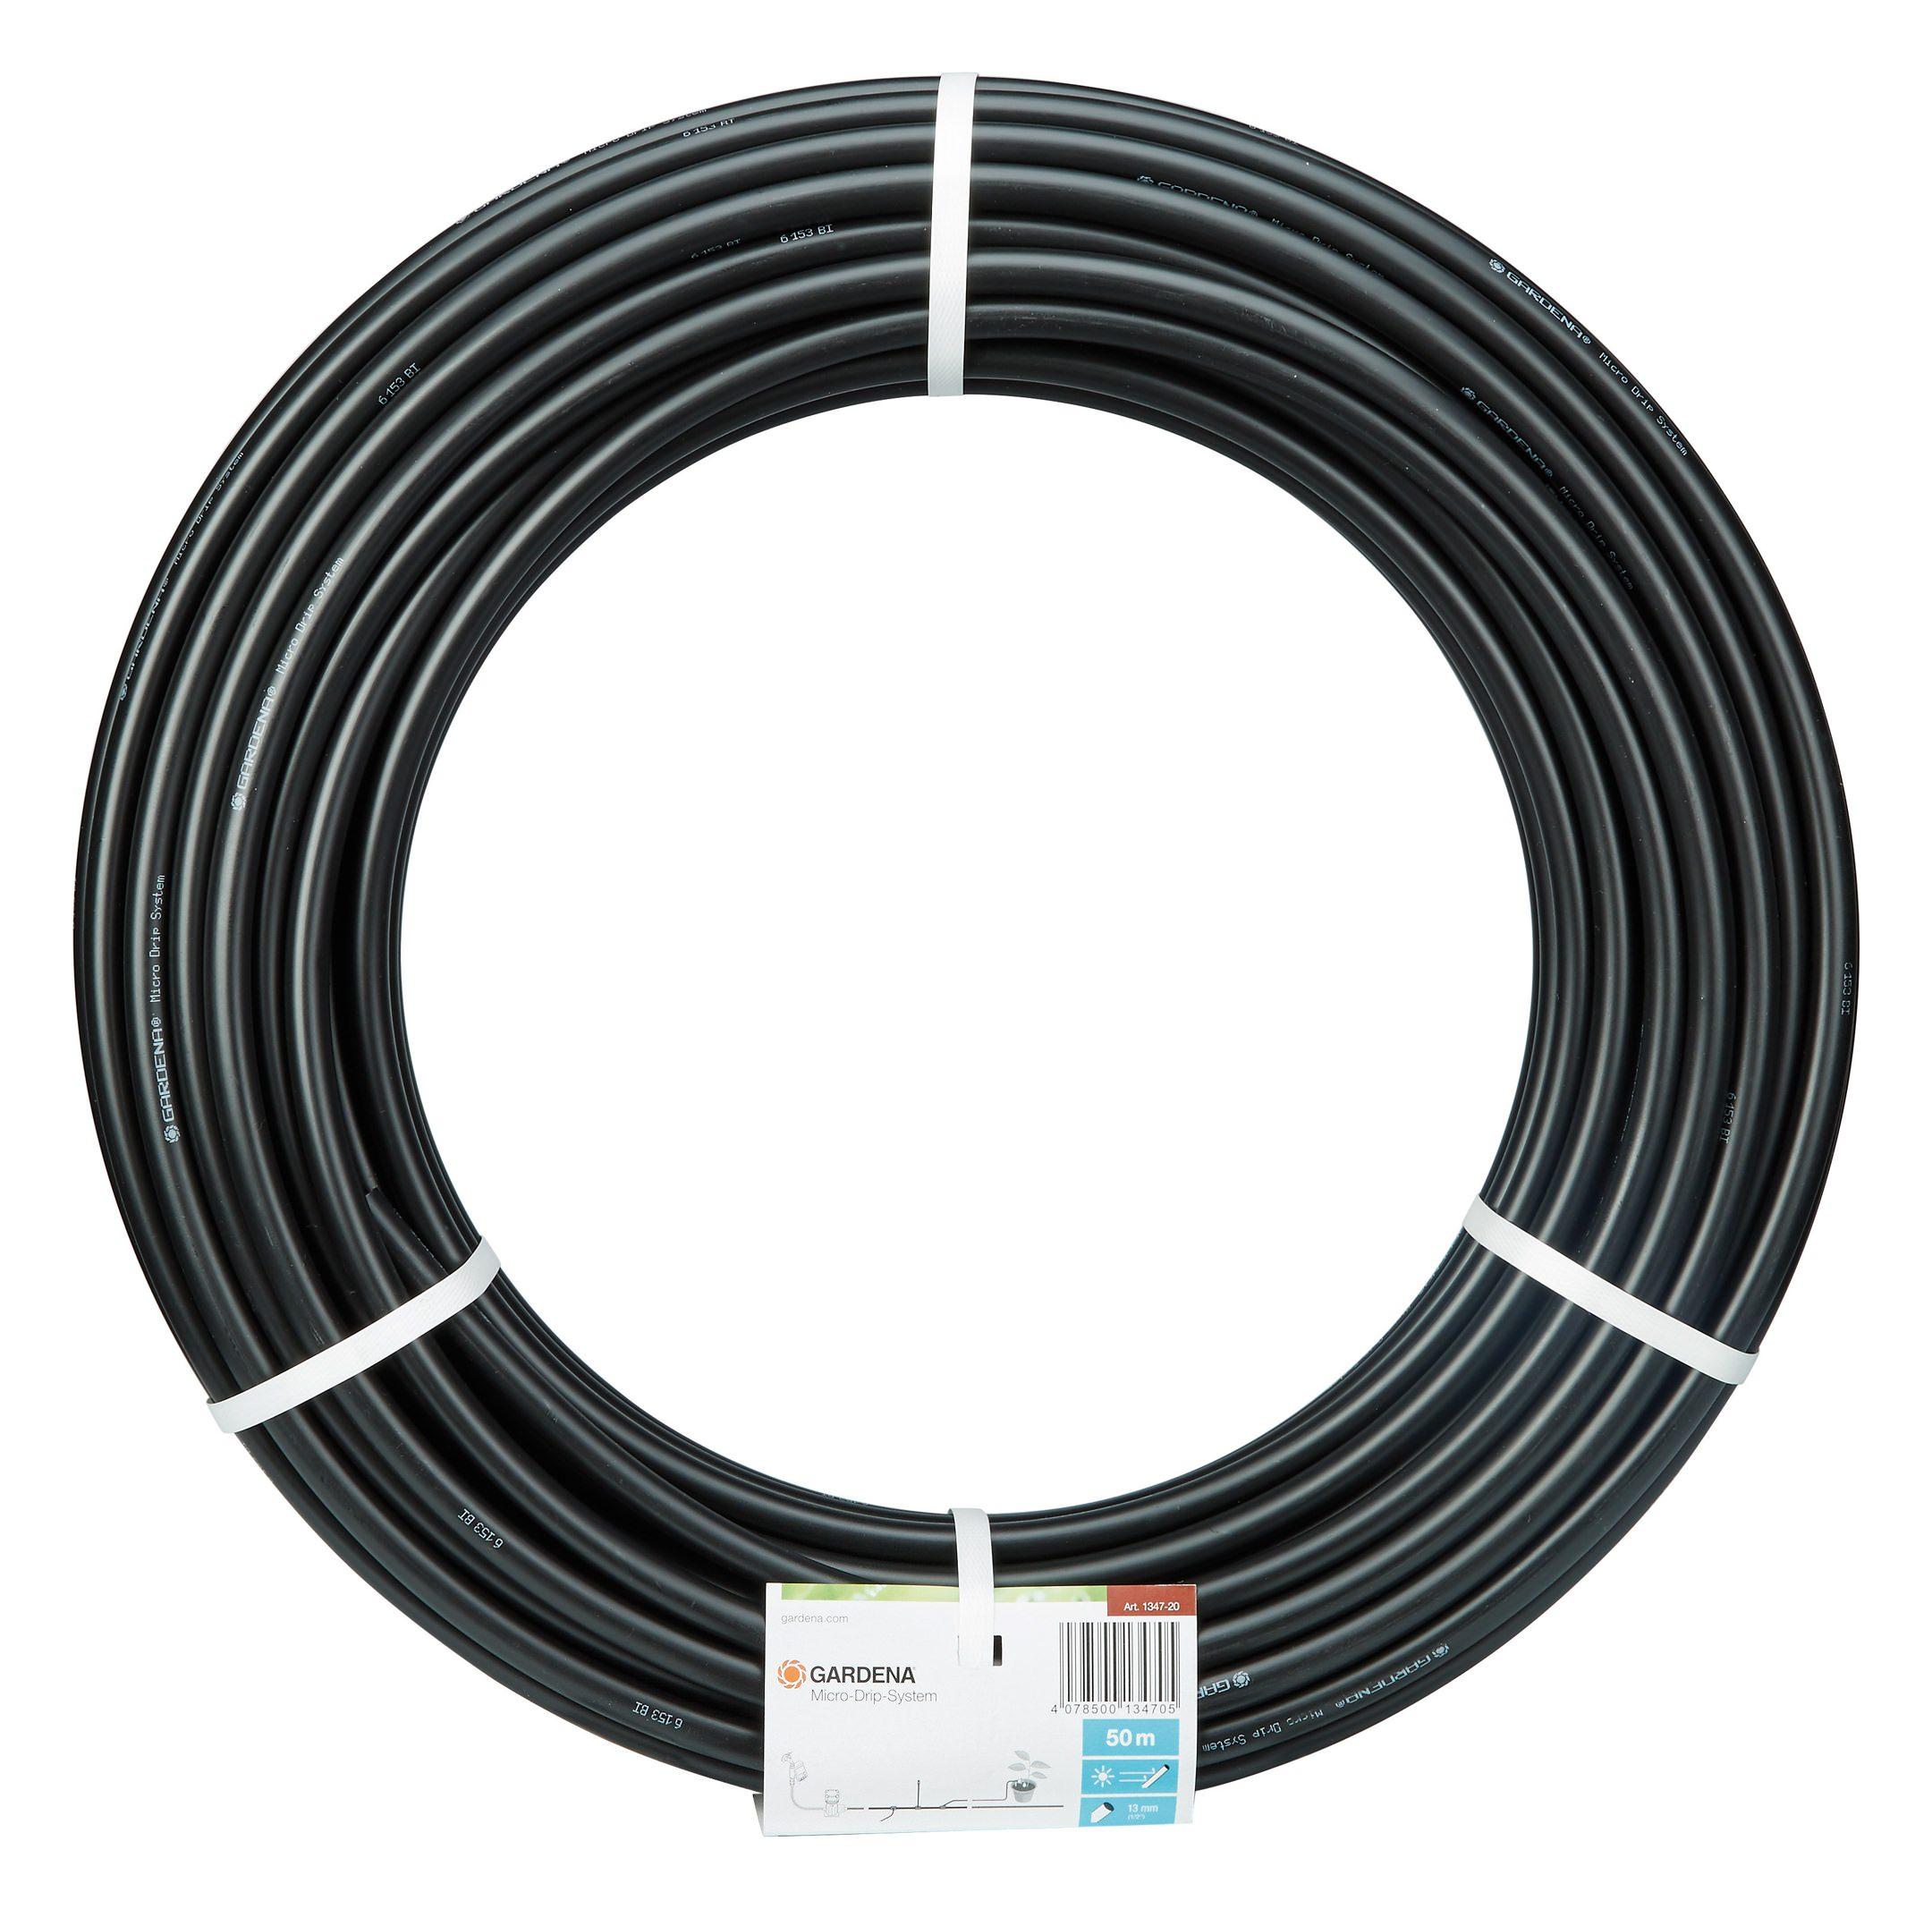 "Gardena Micro-Drip-System Verlegerohr 50 mtr 1/2"" - 13 mm - 01347-20"